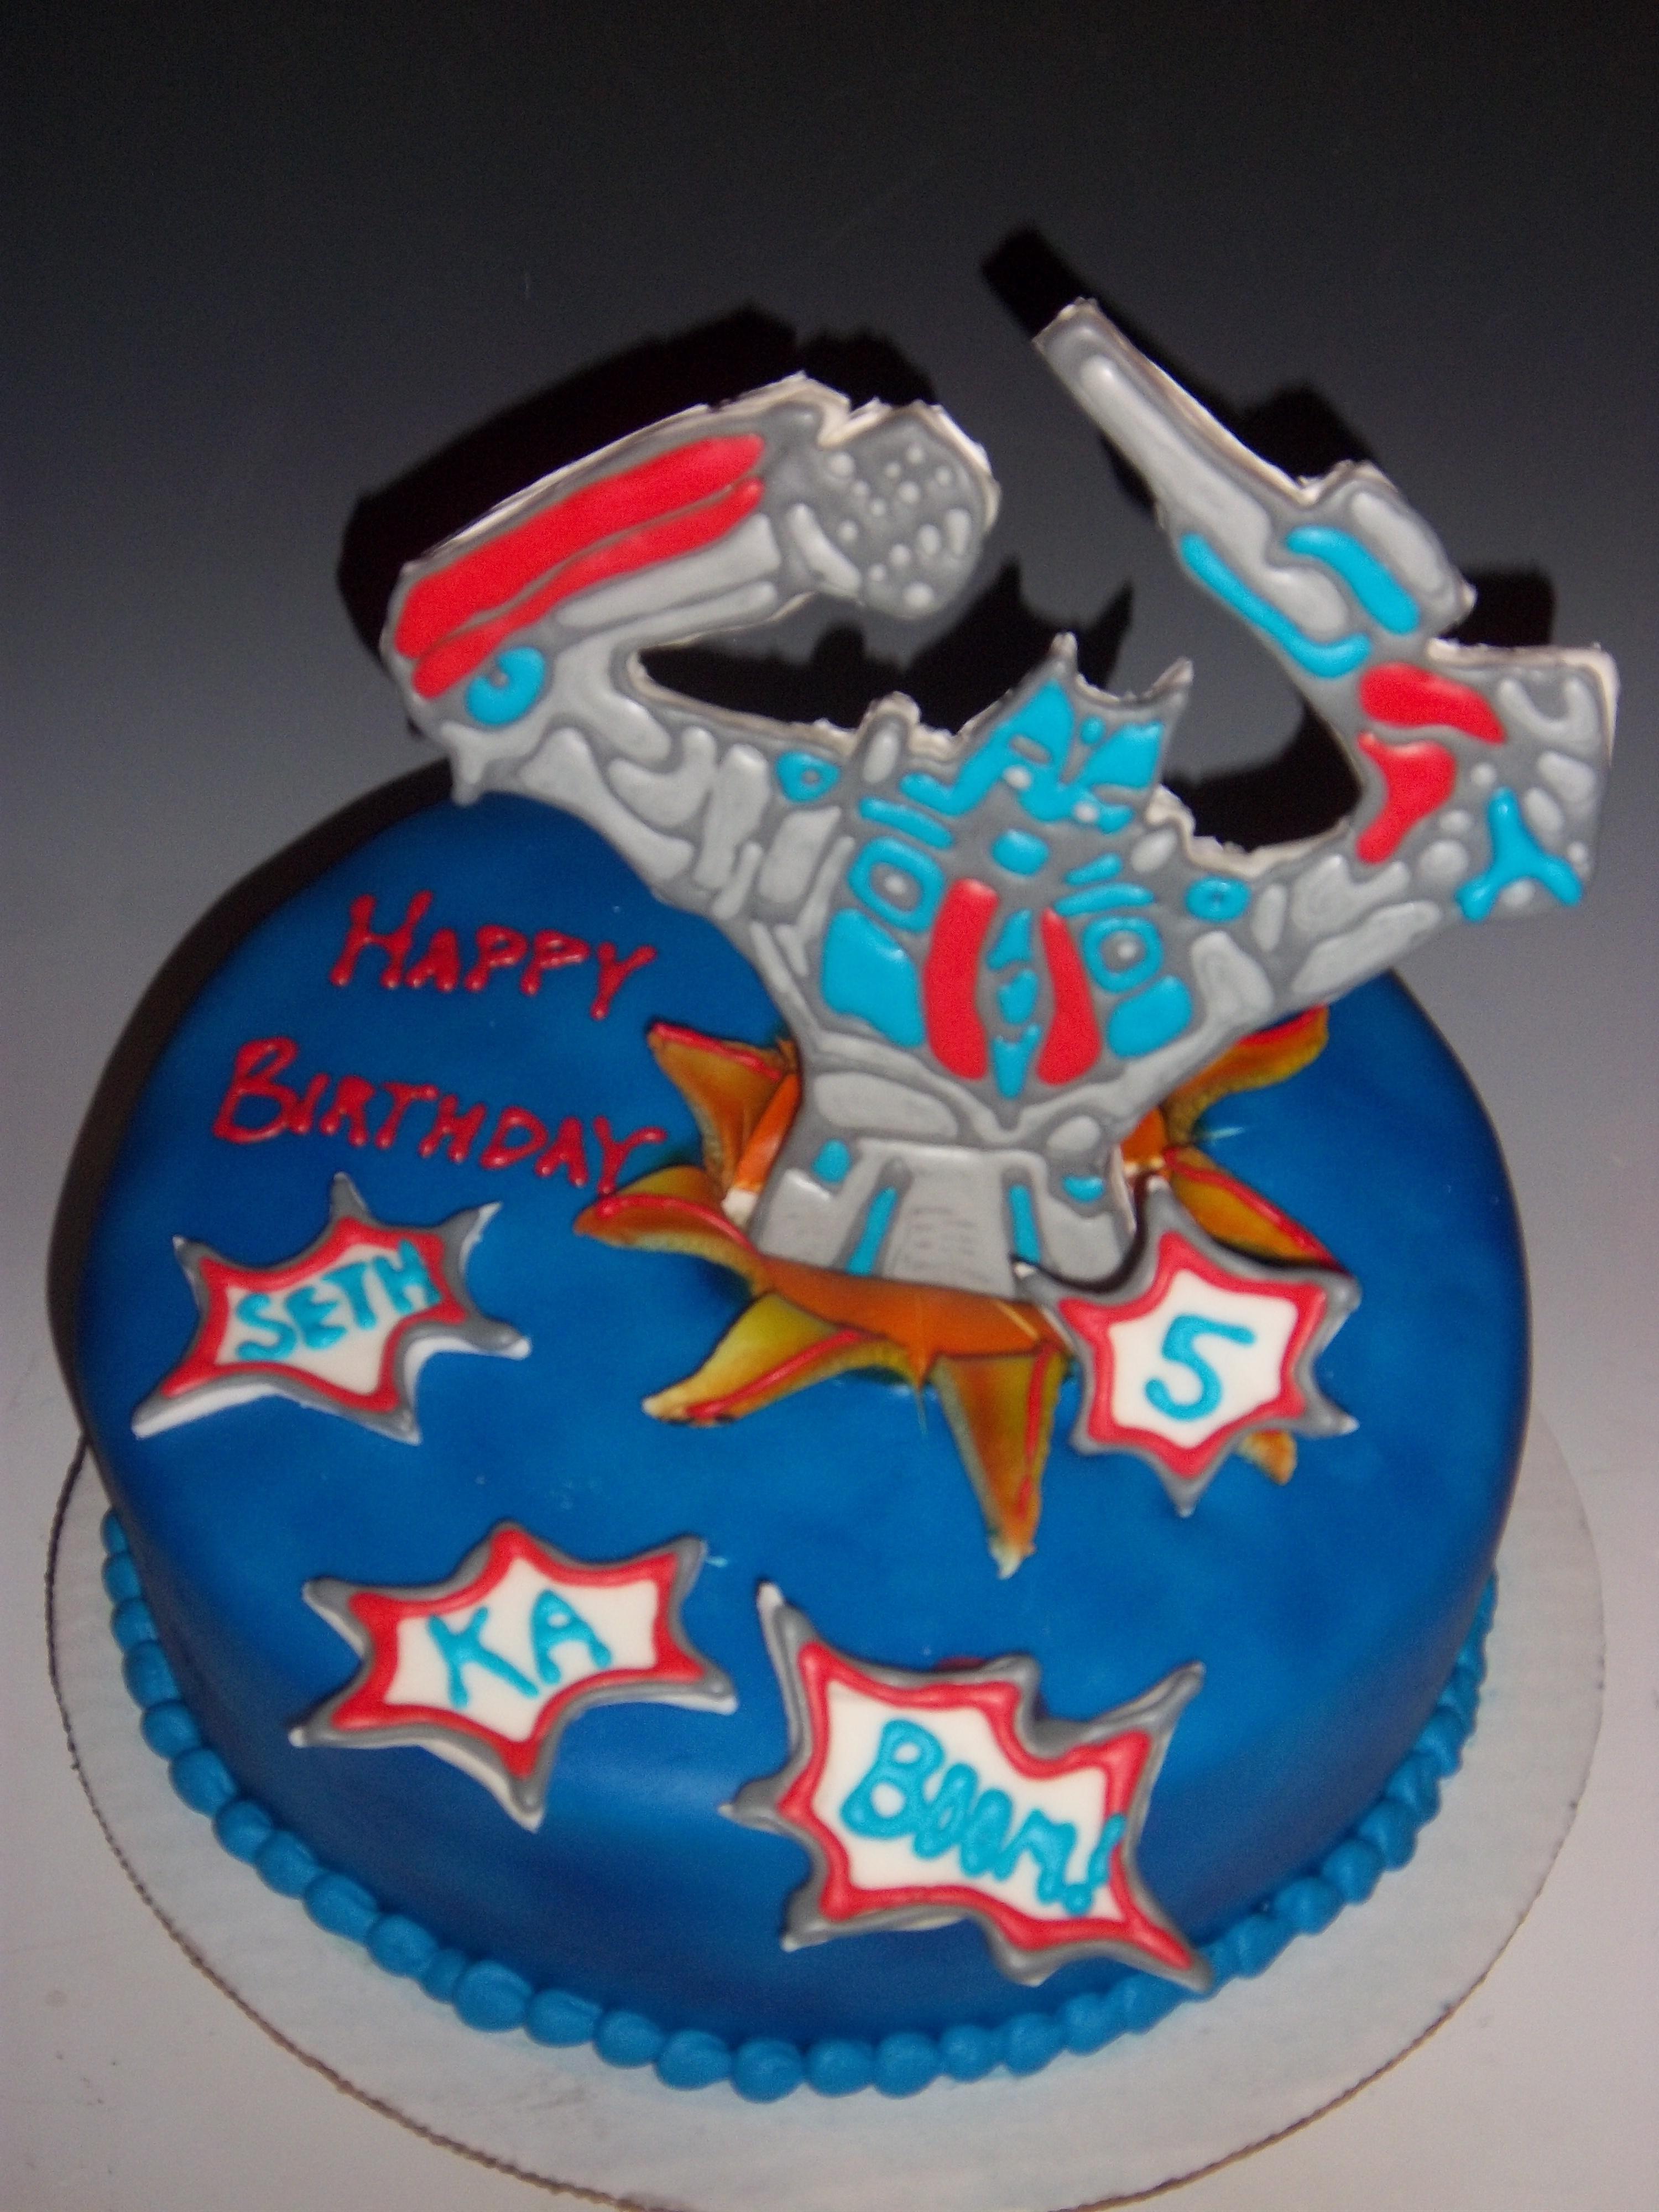 Harley Davidson Cake Decorations Transformer Cakes Decoration Ideas Little Birthday Cakes